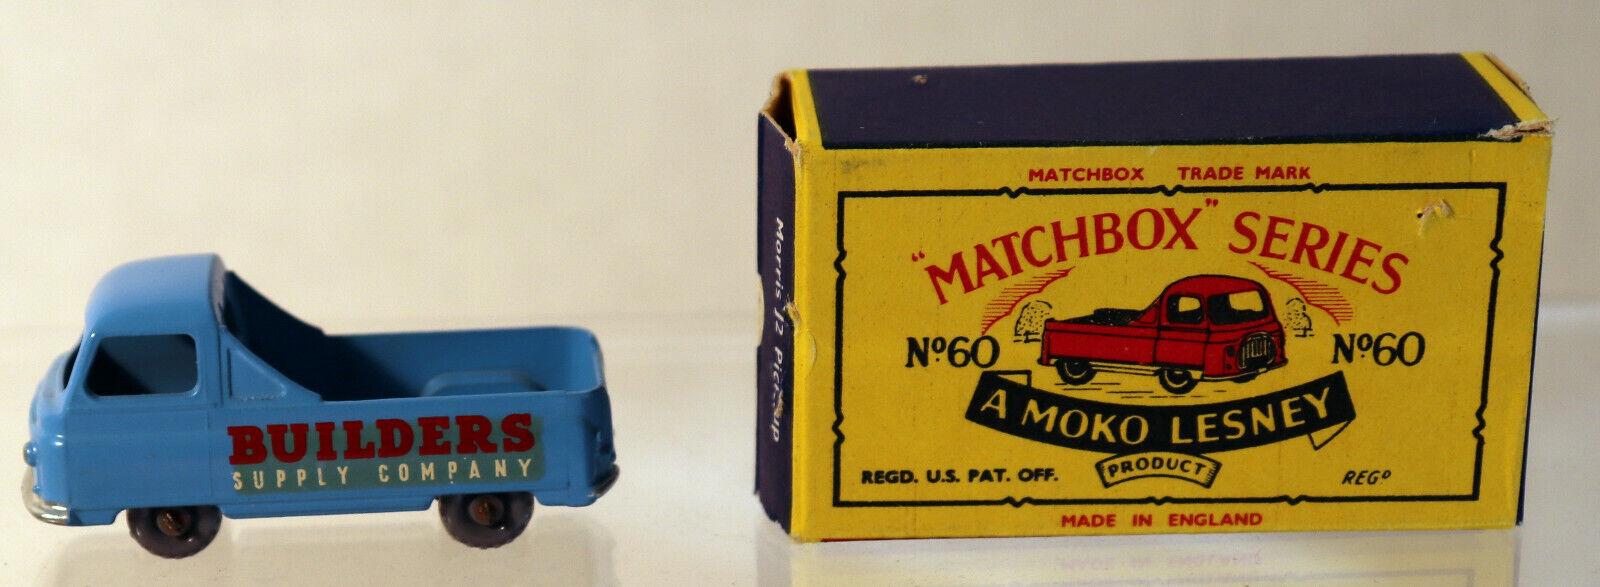 oferta especial DTE Lesney Matchbox Matchbox Matchbox Regular ruedas 60-1 Rojo blancoo Calcomanía constructores de suministro Gpw California  descuento de bajo precio